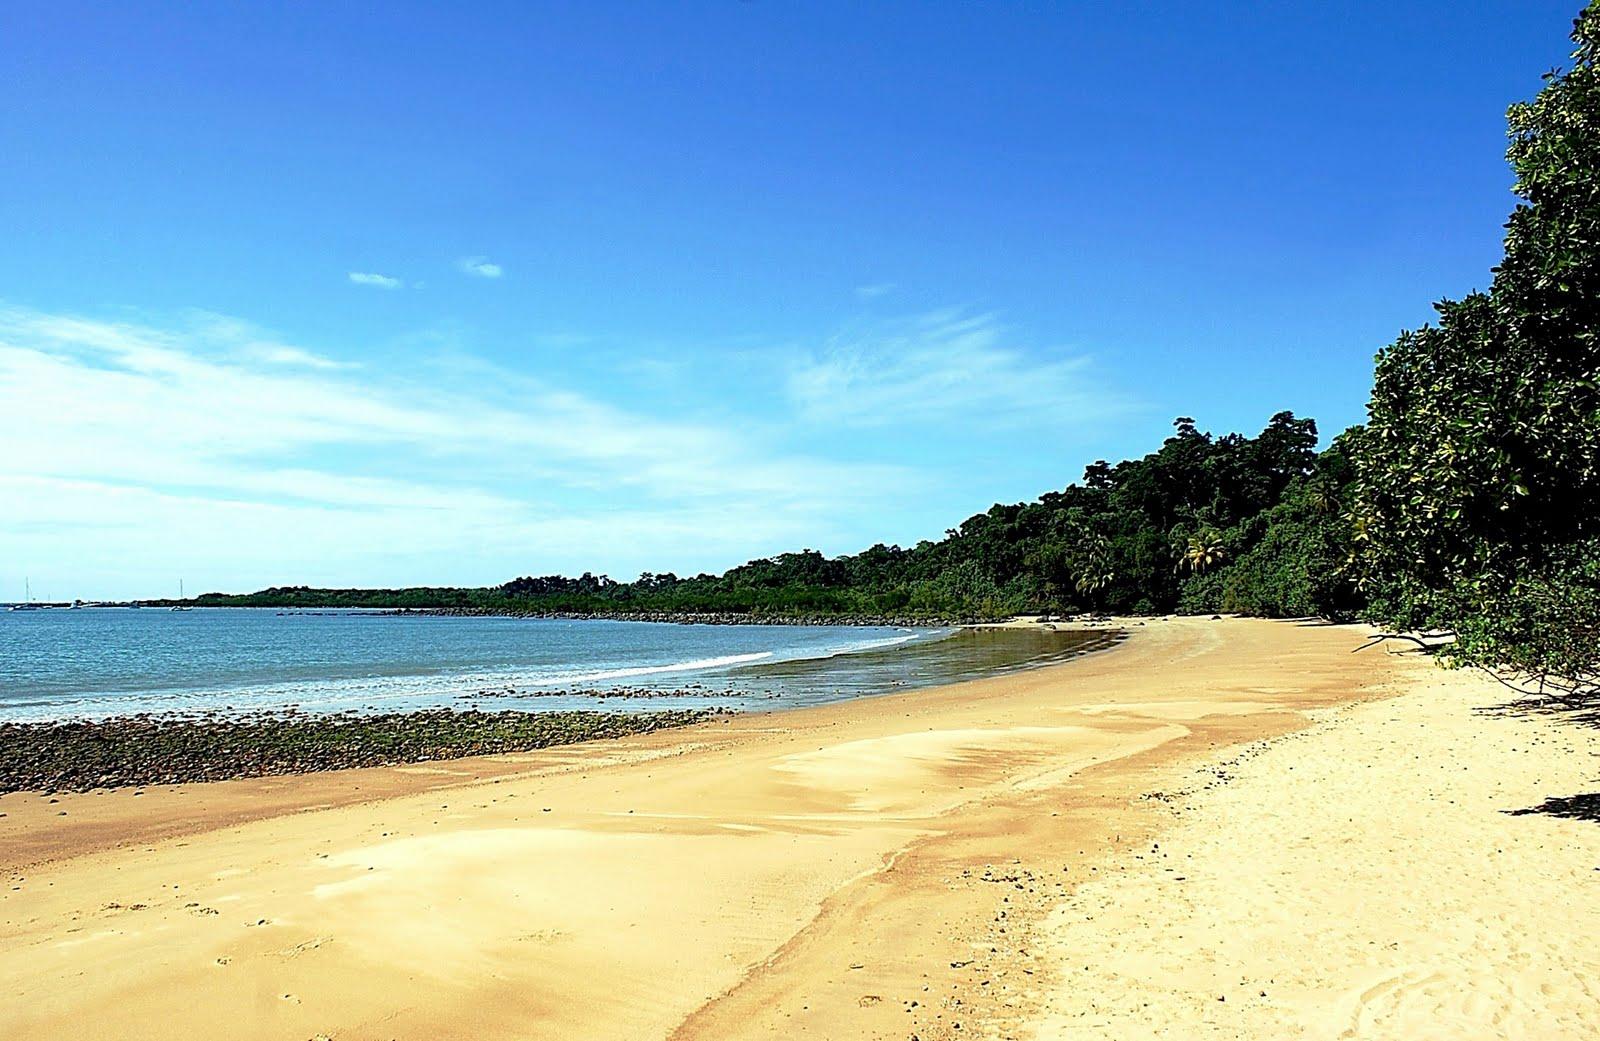 Island Ct Mission Beach